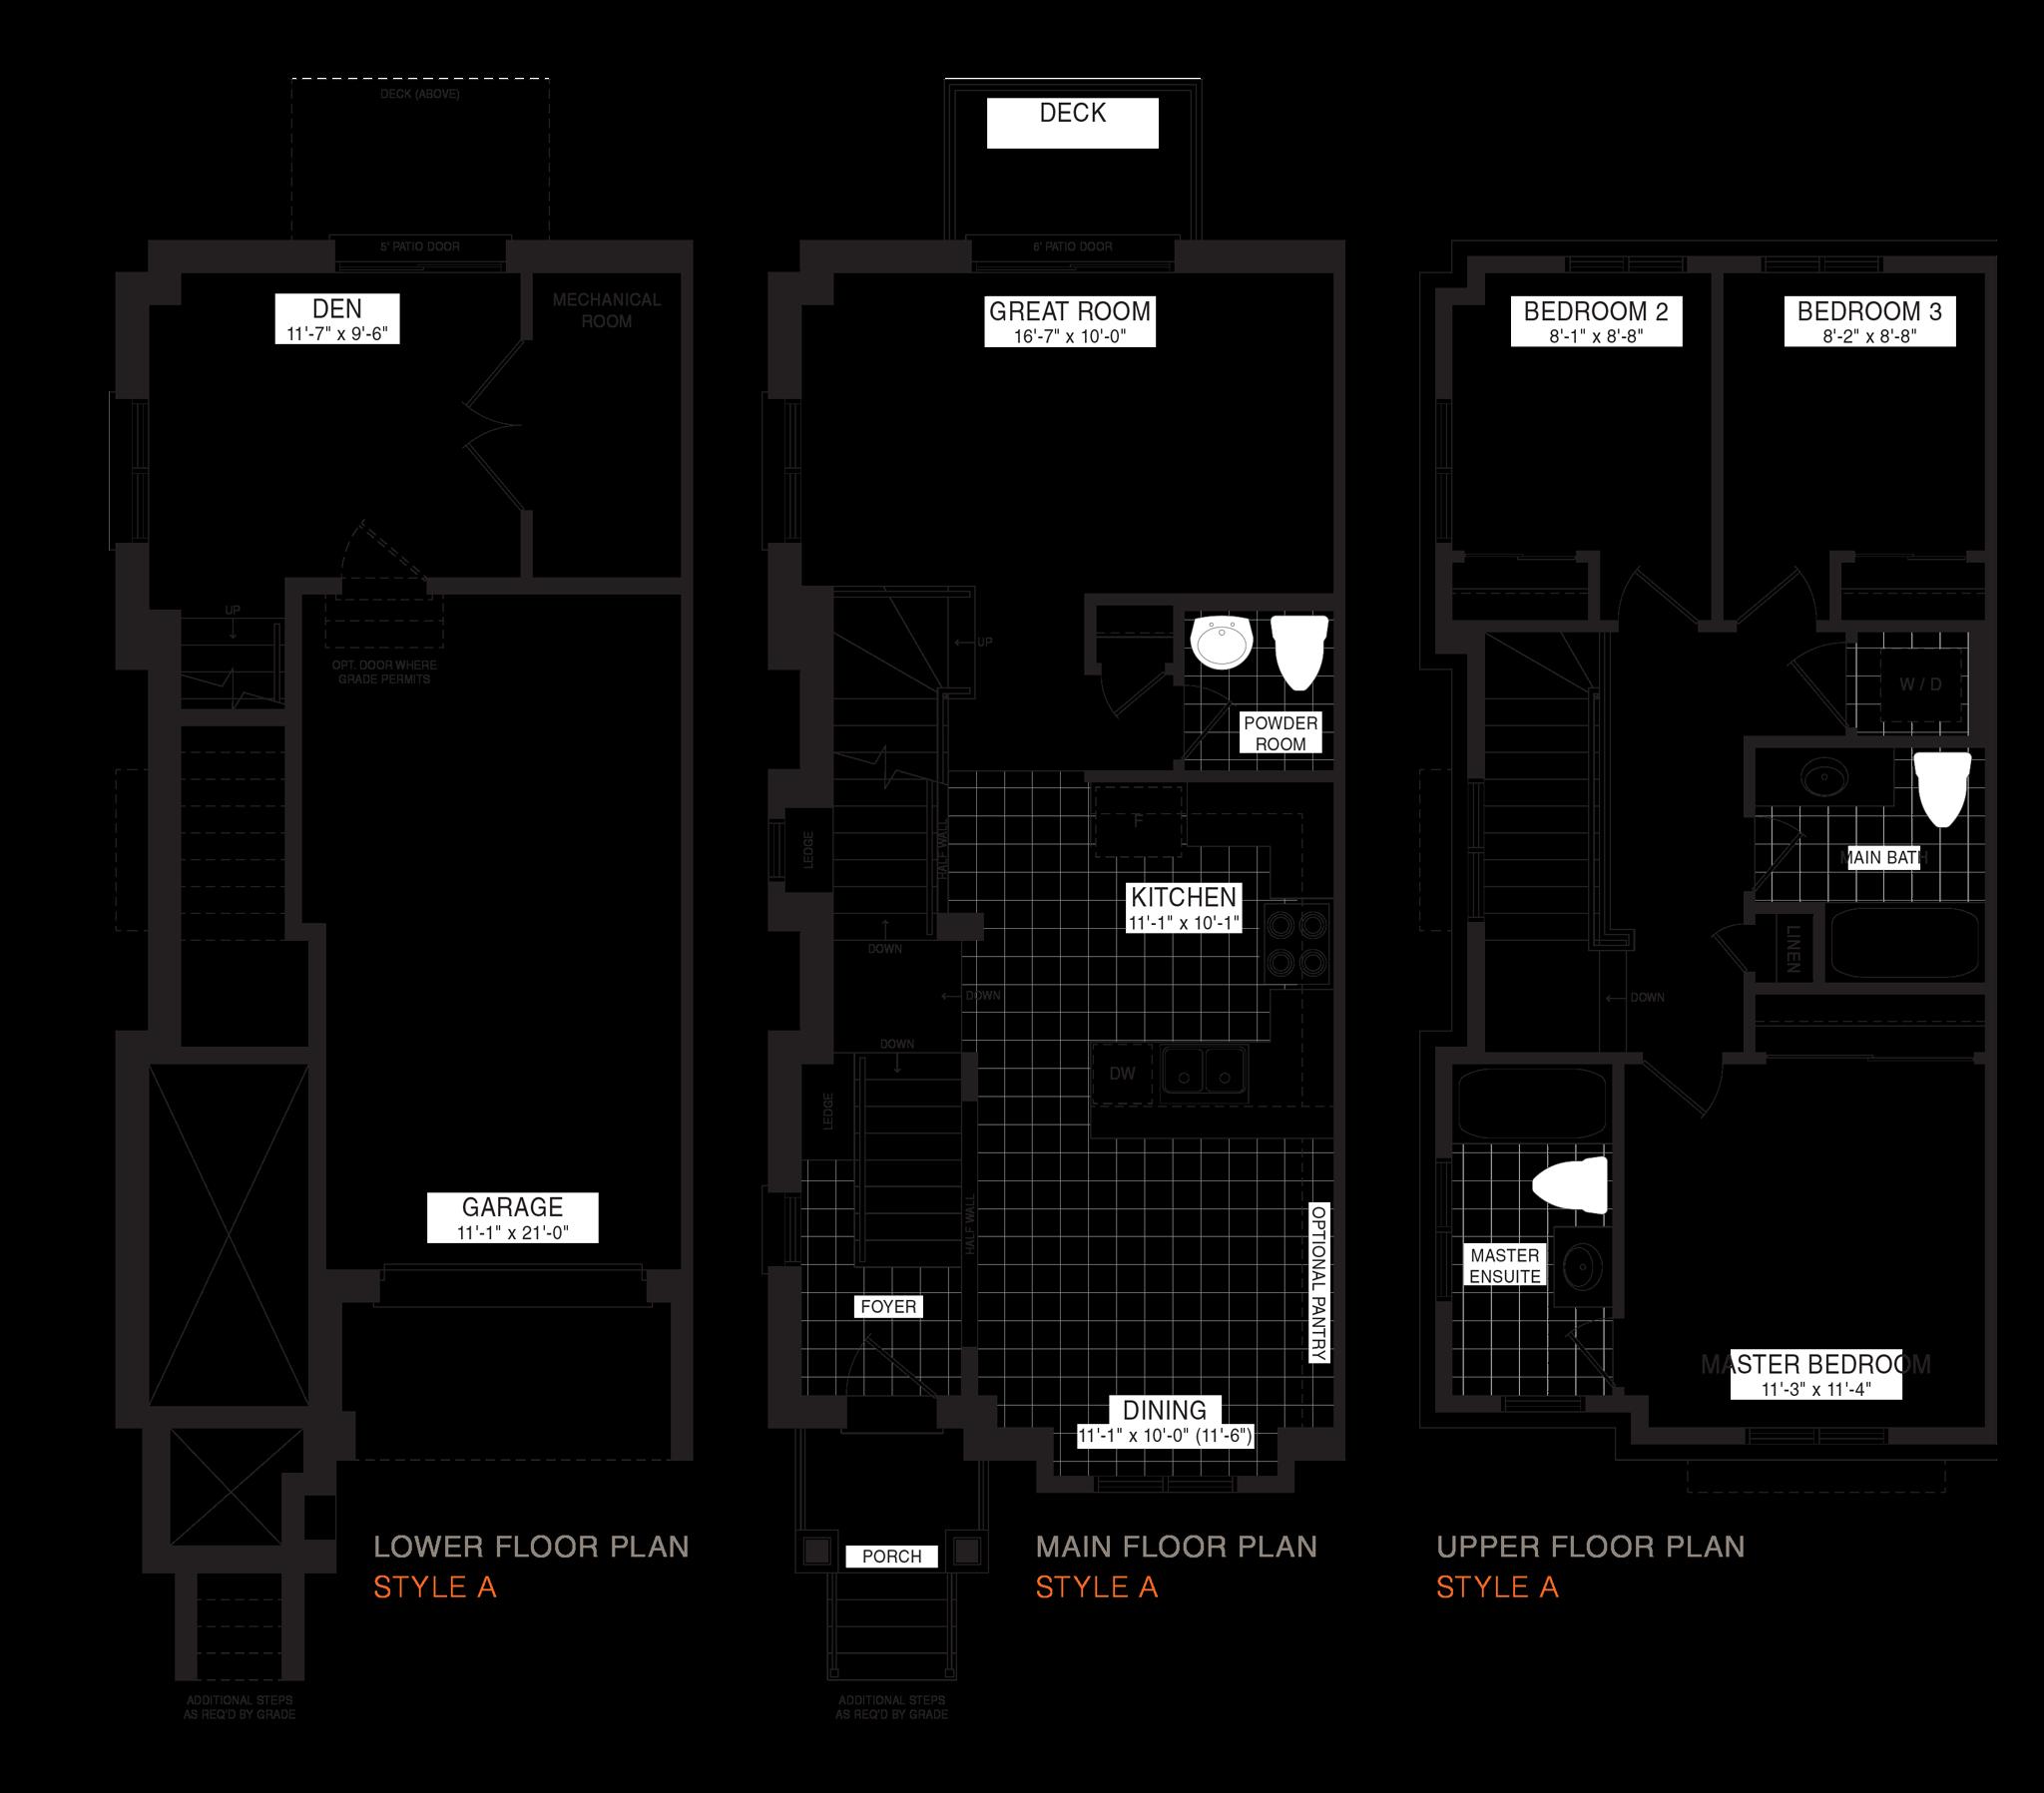 Moncton-Corner-Moncton-S3-1602-COR-B-floor-plan